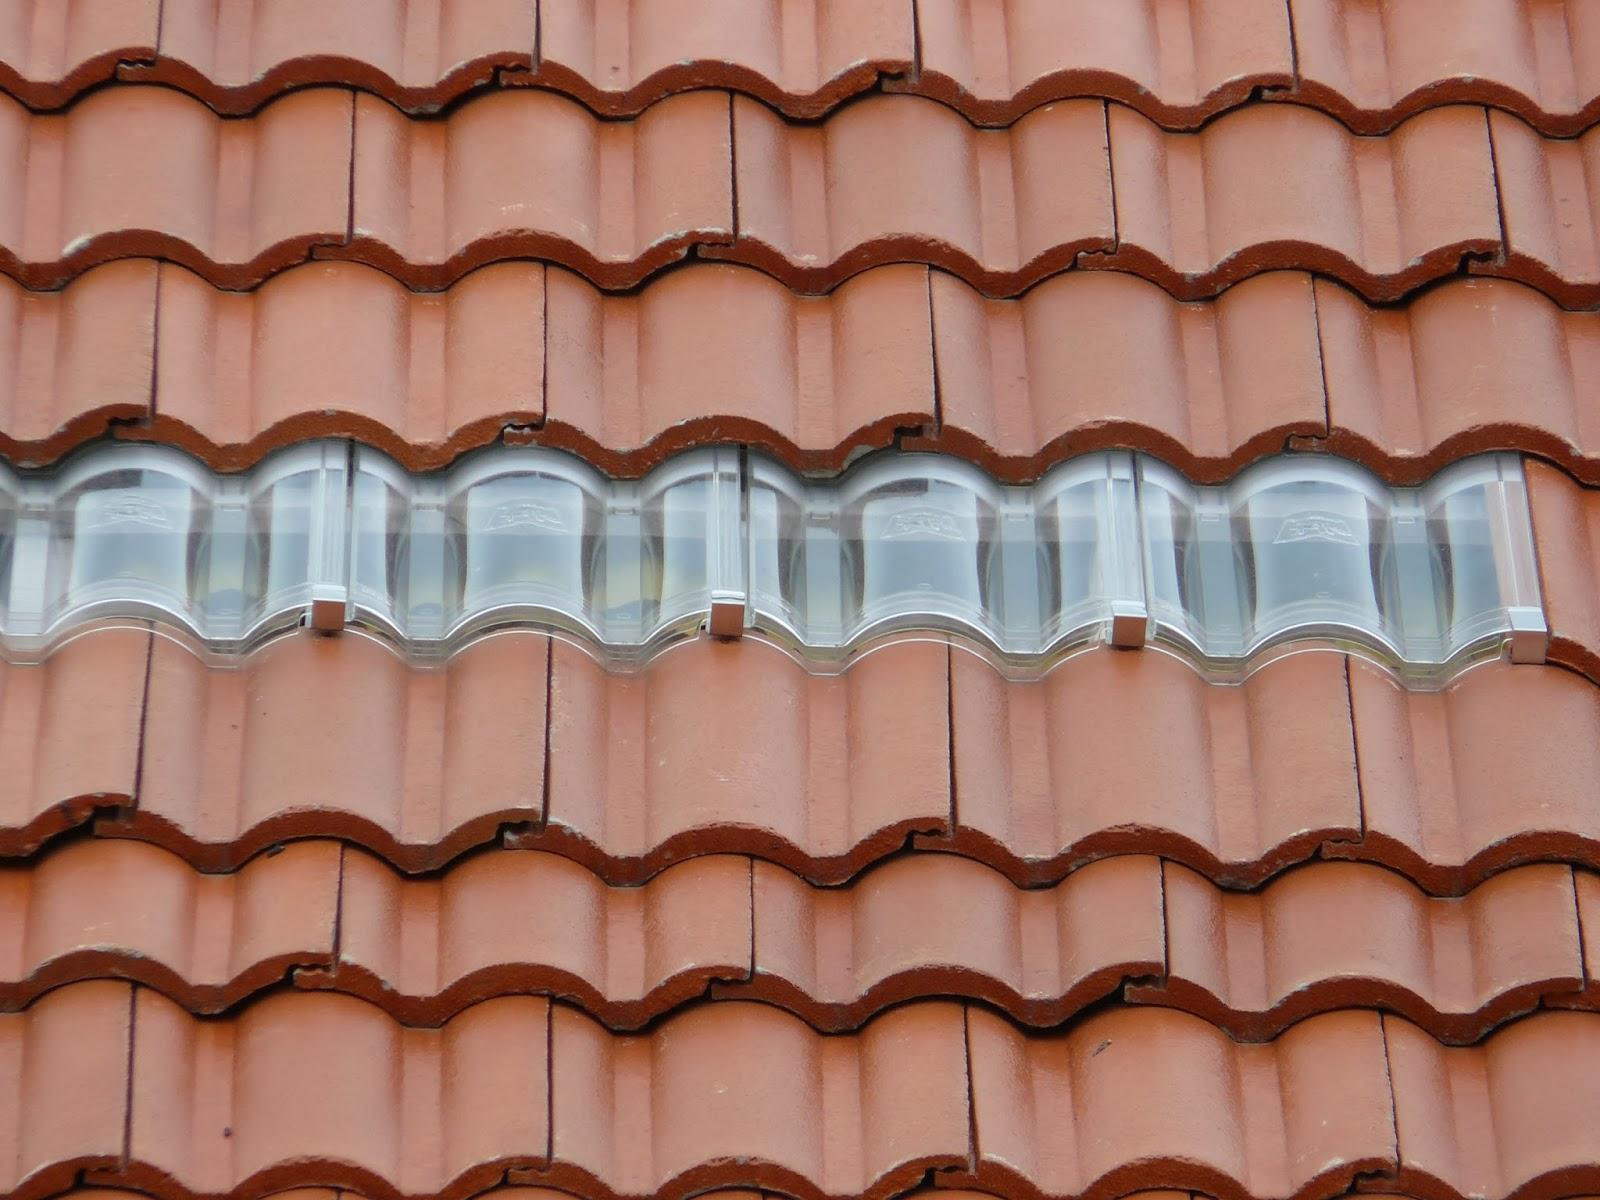 Foundation dezin decor roof tiles for Ciment tiles